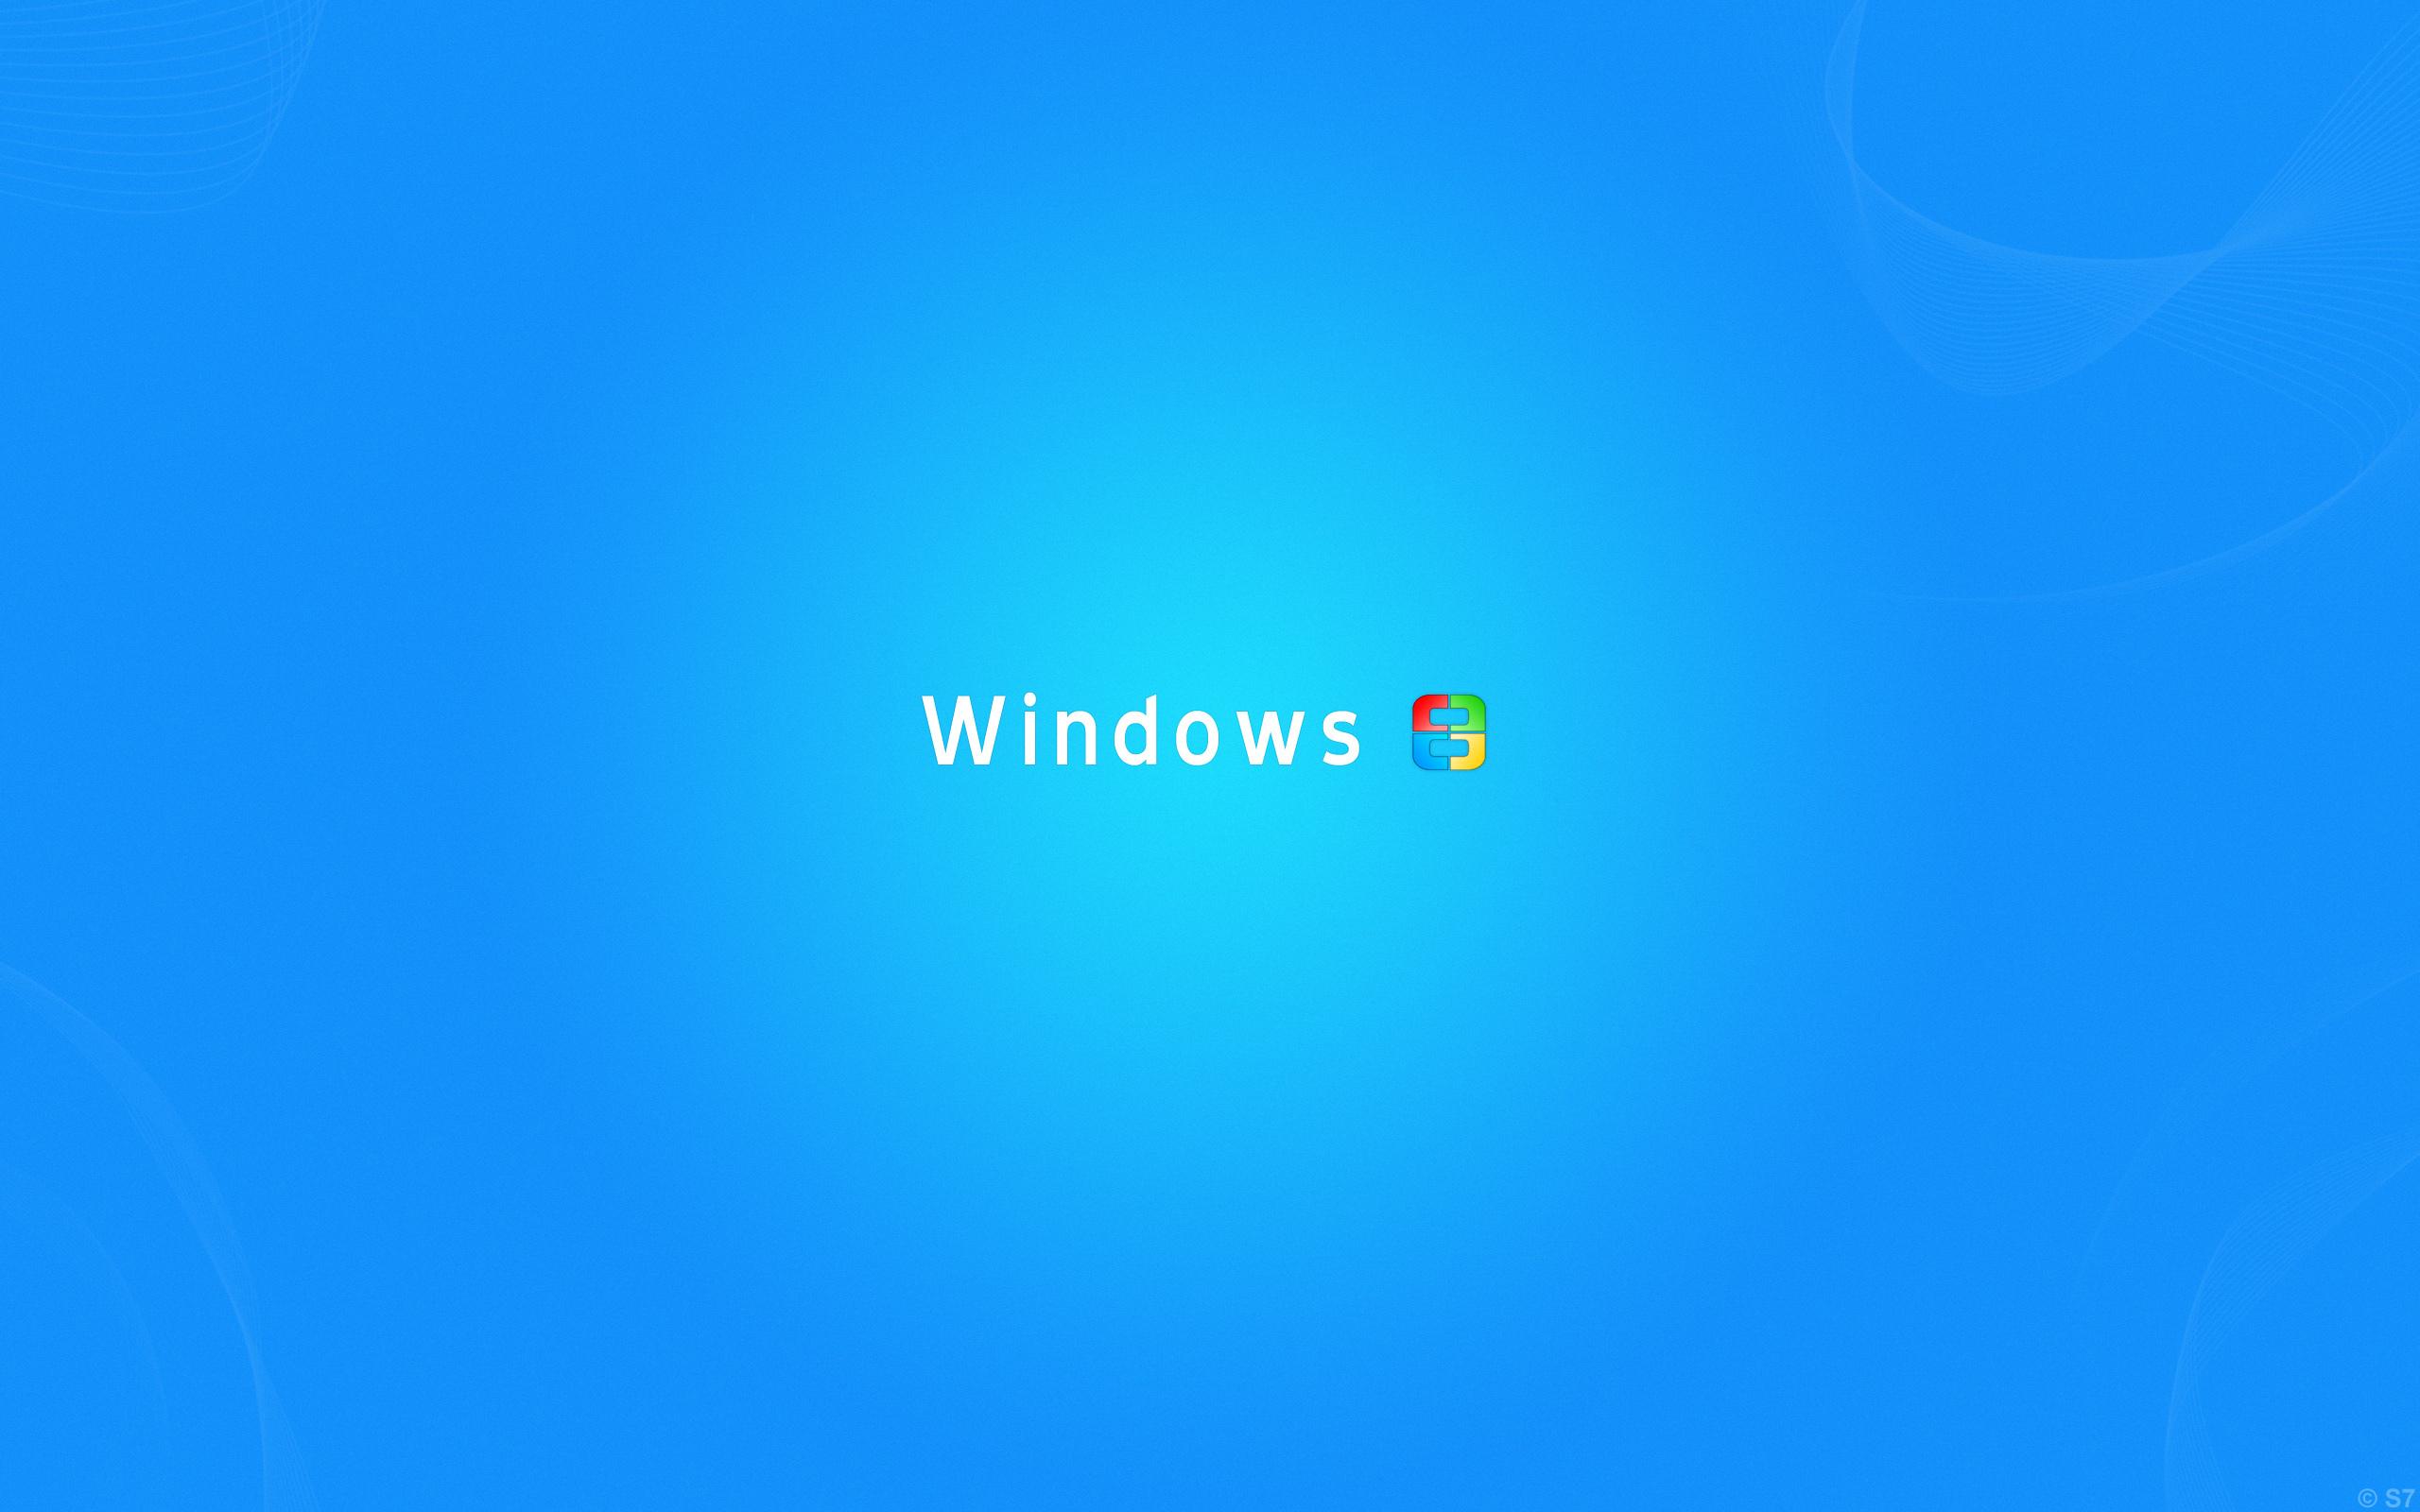 Entertainment Free Microsoft Windows Pickmore 1751934 Wallpaper wallpaper